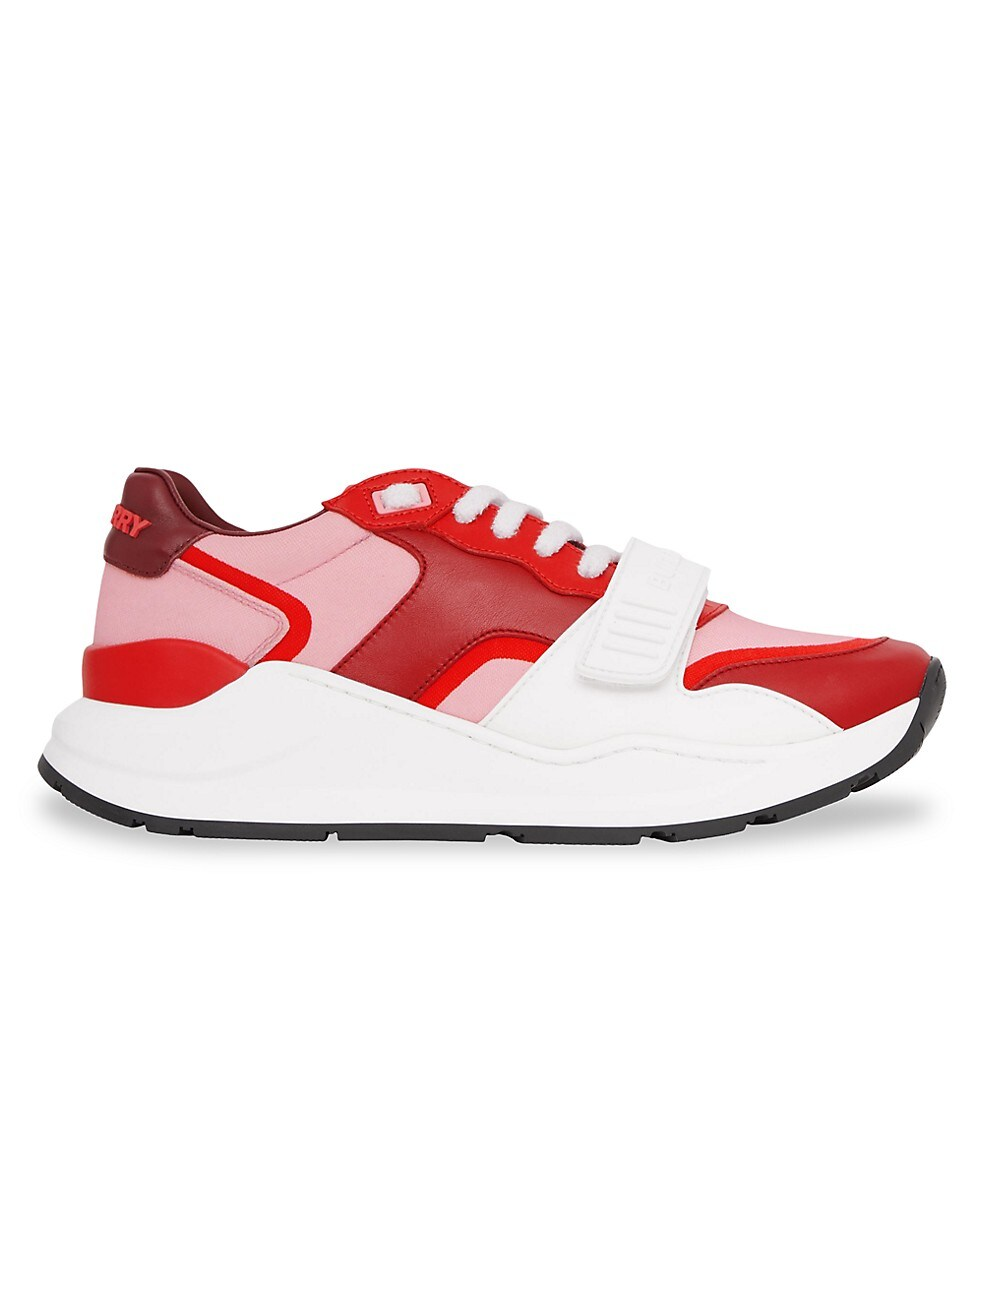 Burberry Ramsey Colorblock Sneakers